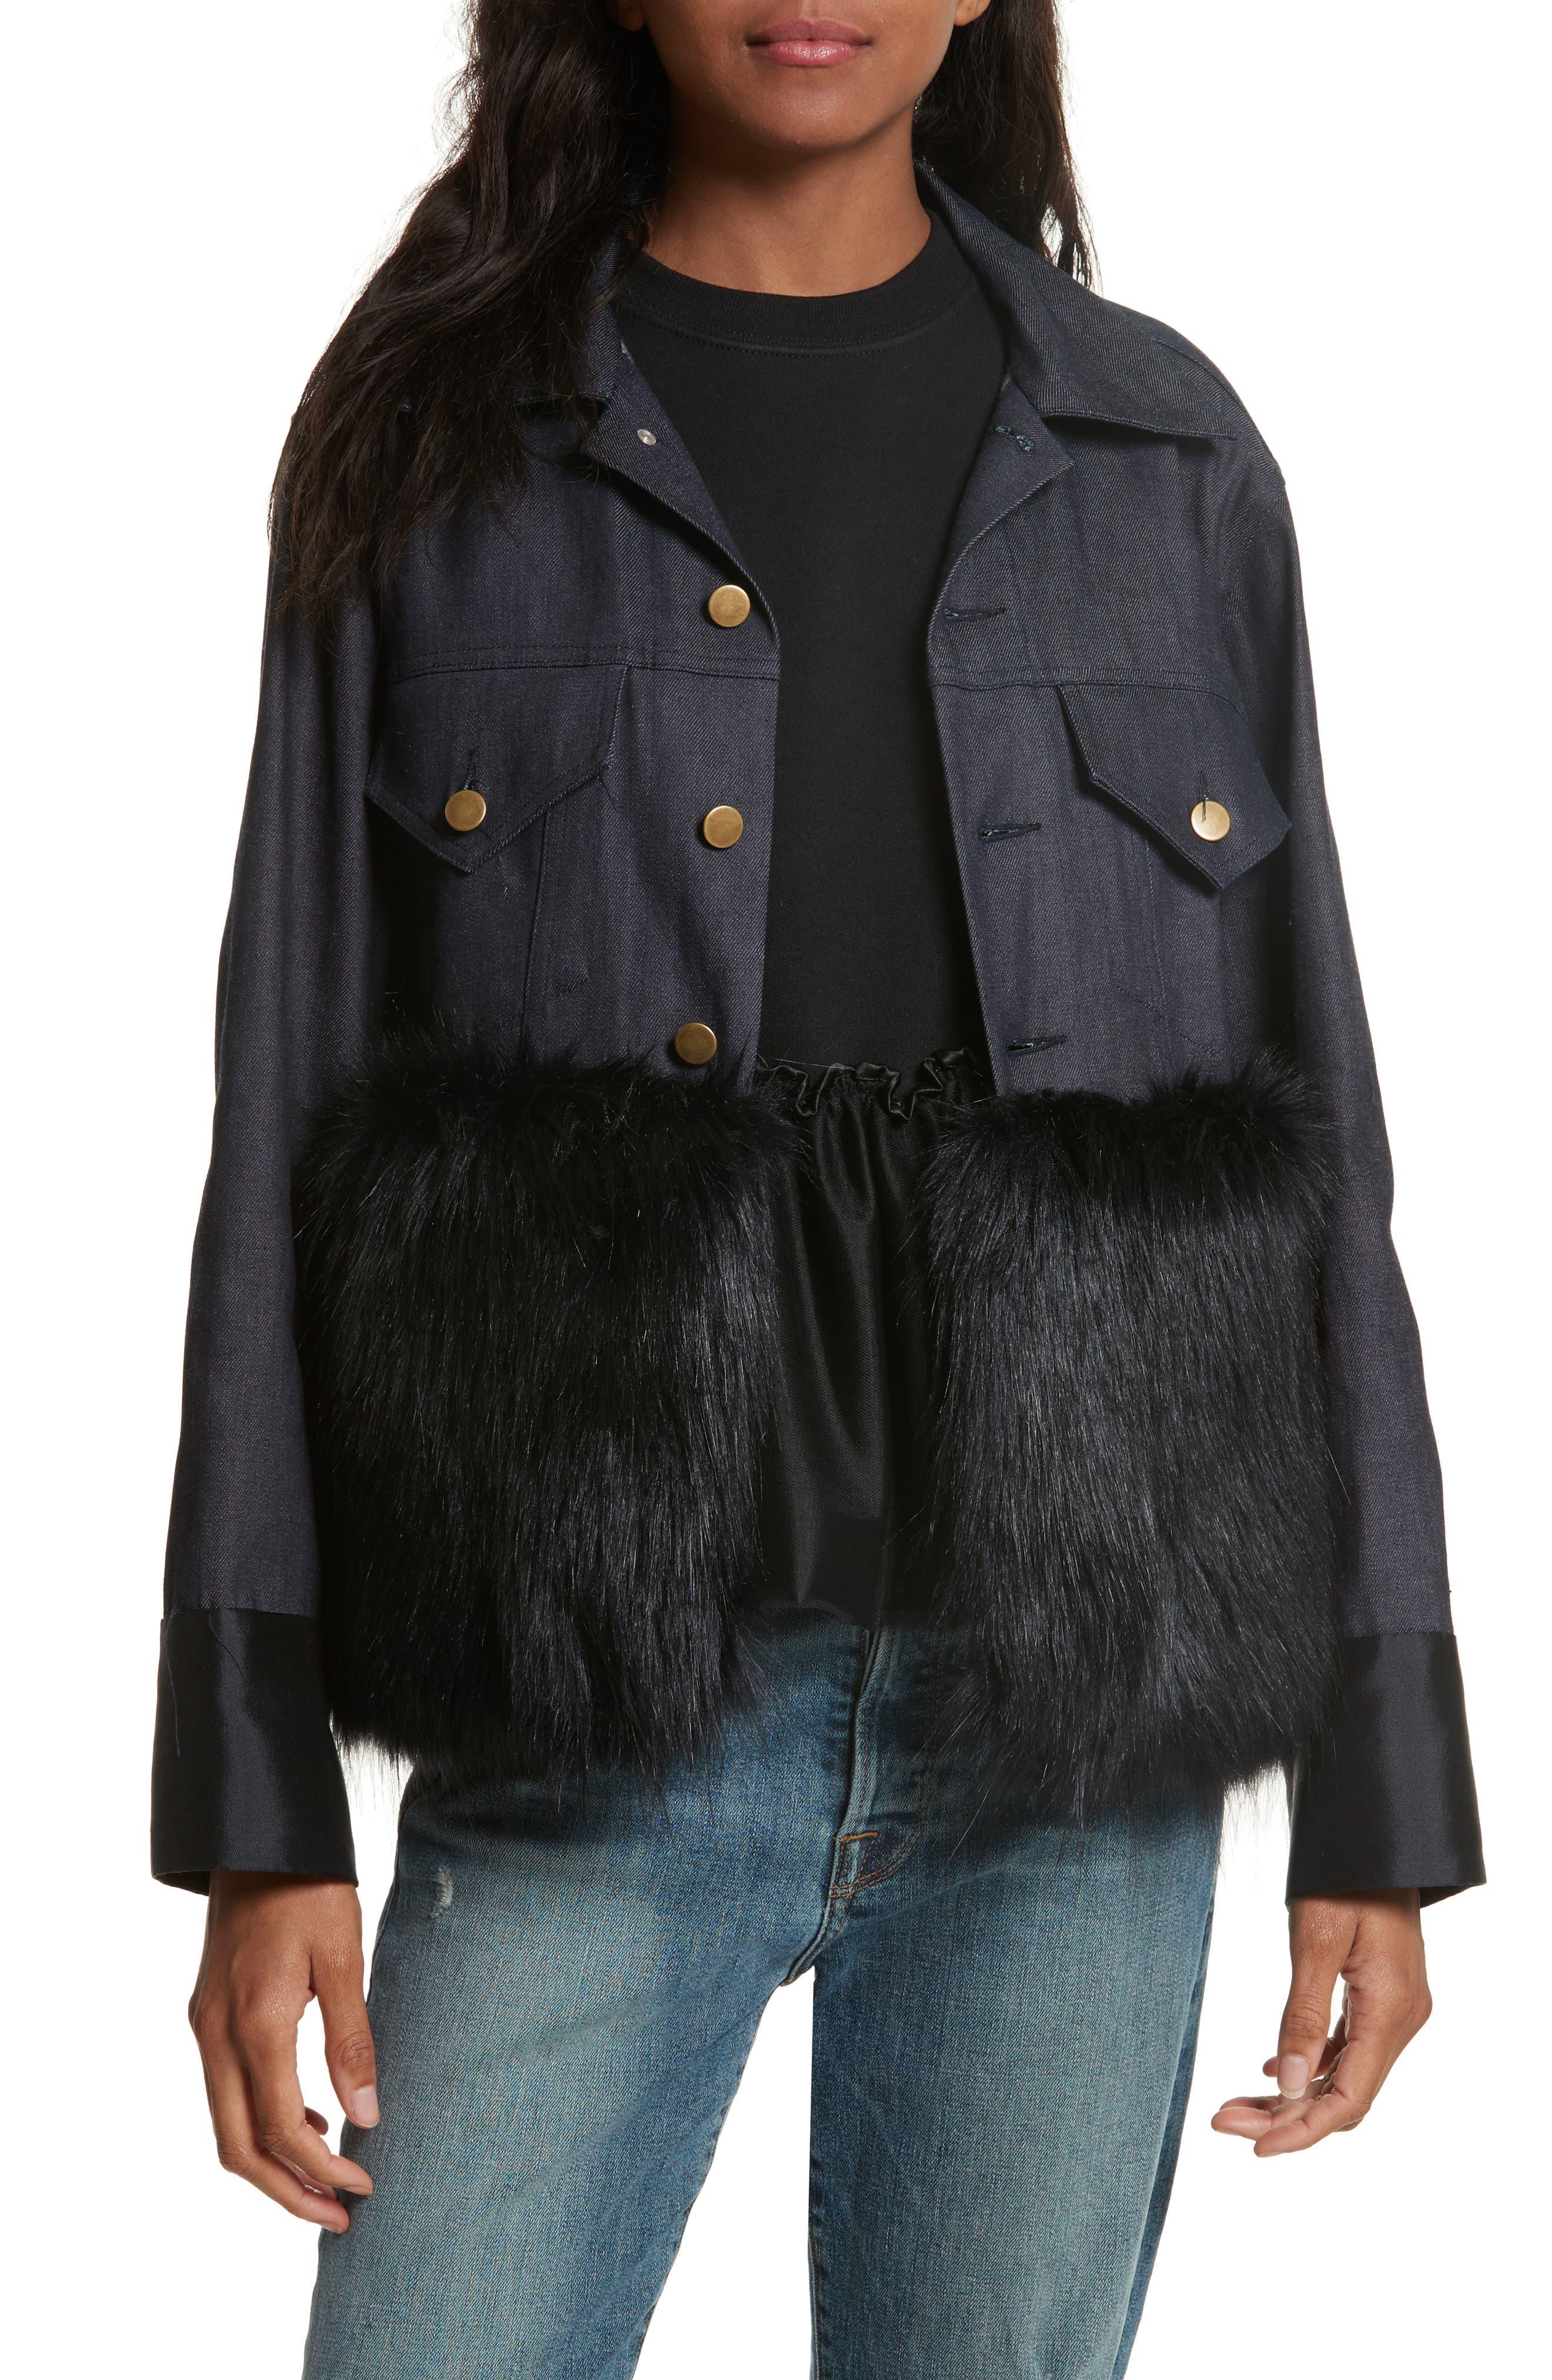 Harvey Faircloth Denim Jacket with Faux Fur Trim